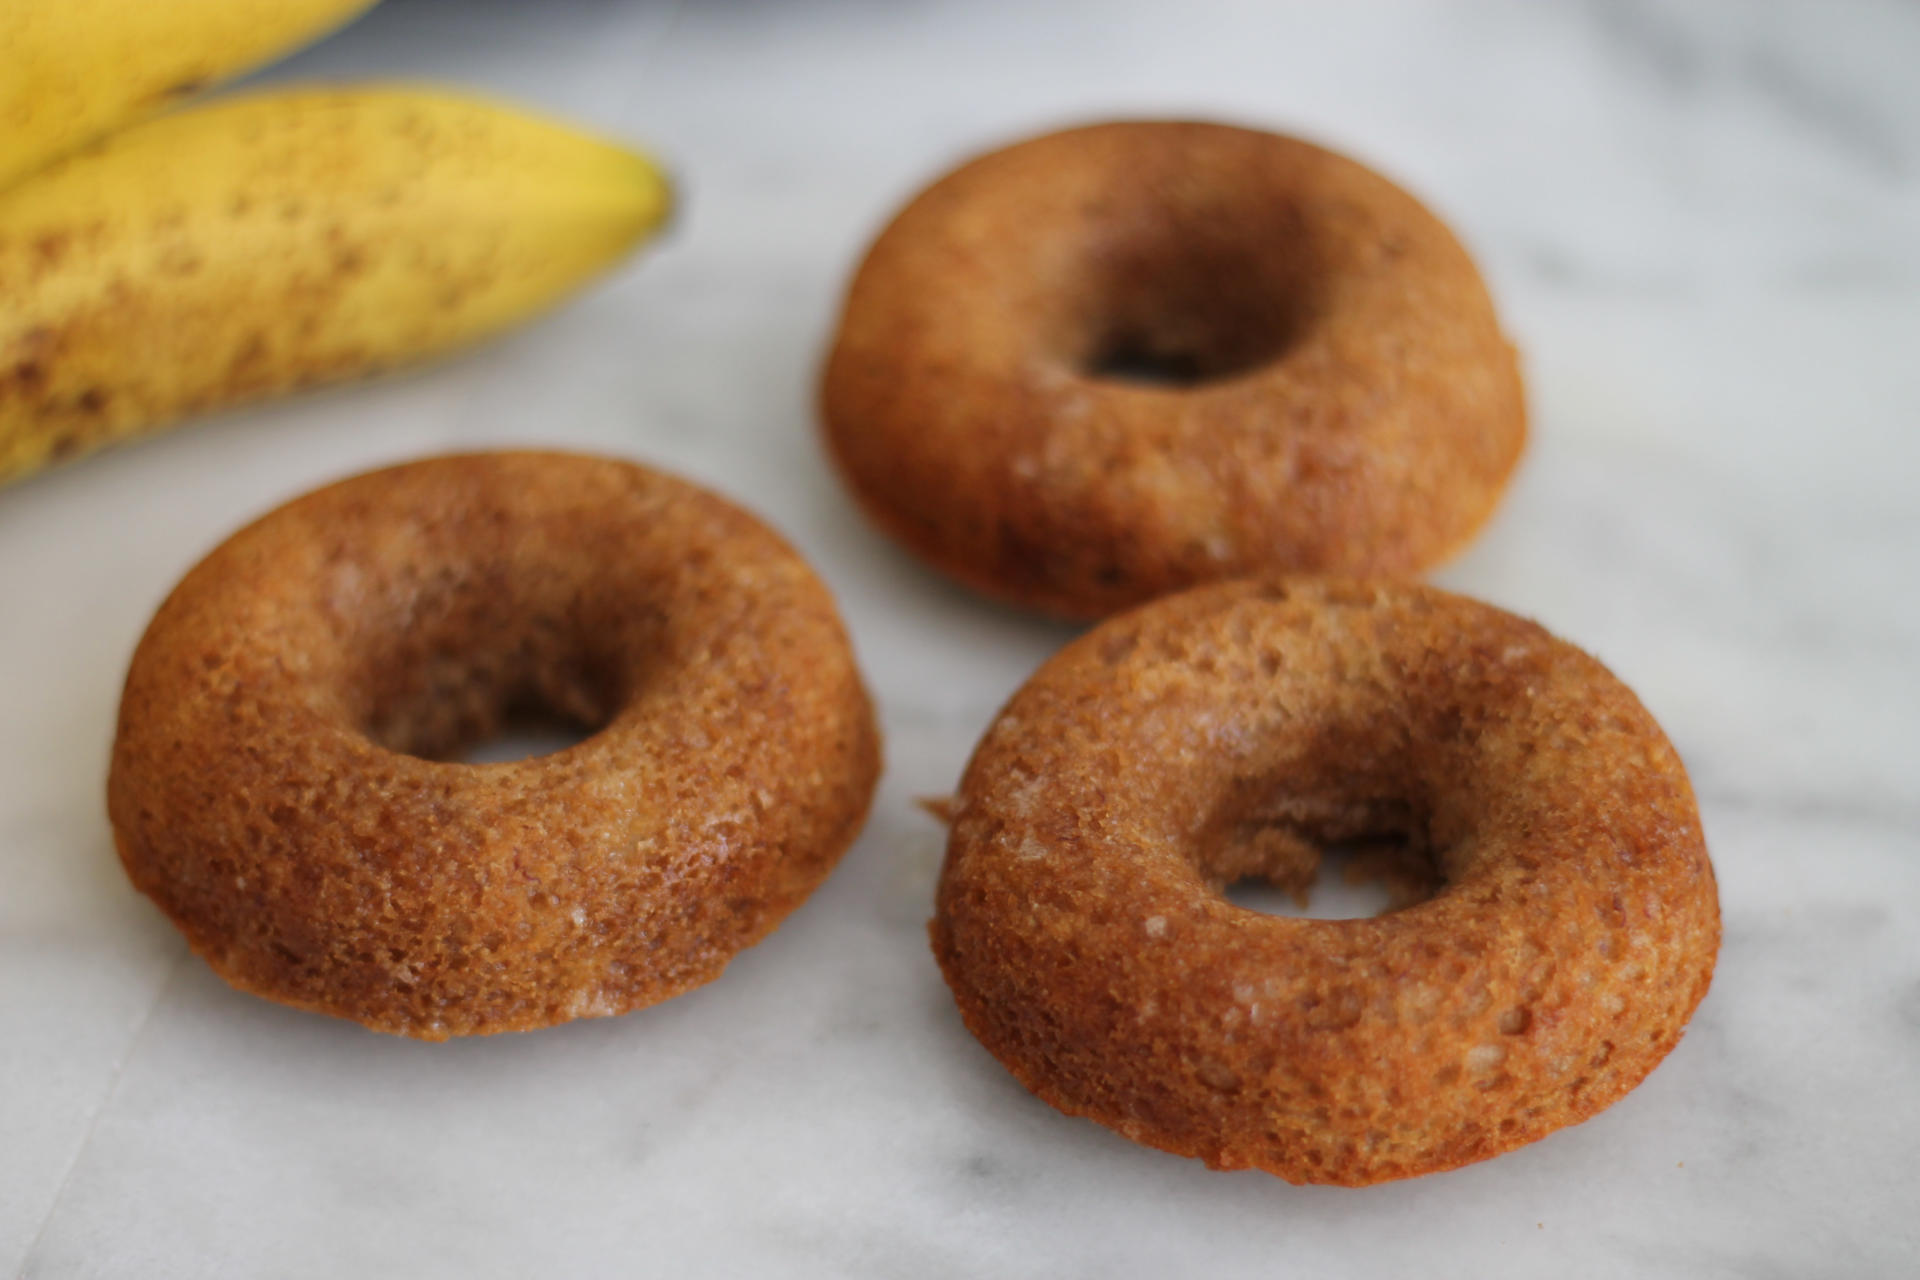 Healthy Baked Banana Doughnuts